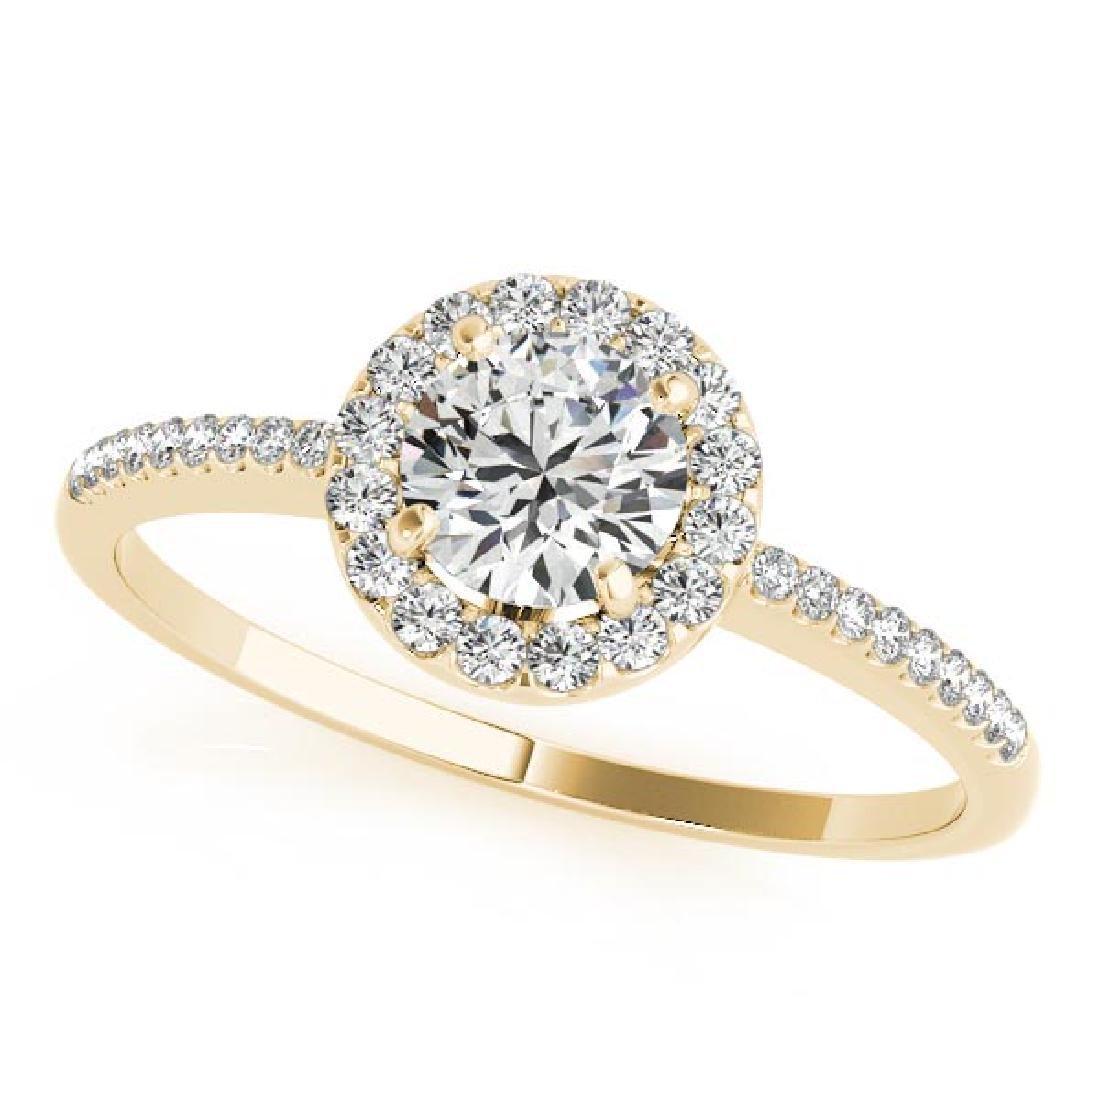 CERTIFIED 18K YELLOW GOLD 1.10 CT G-H/VS-SI1 DIAMOND HA